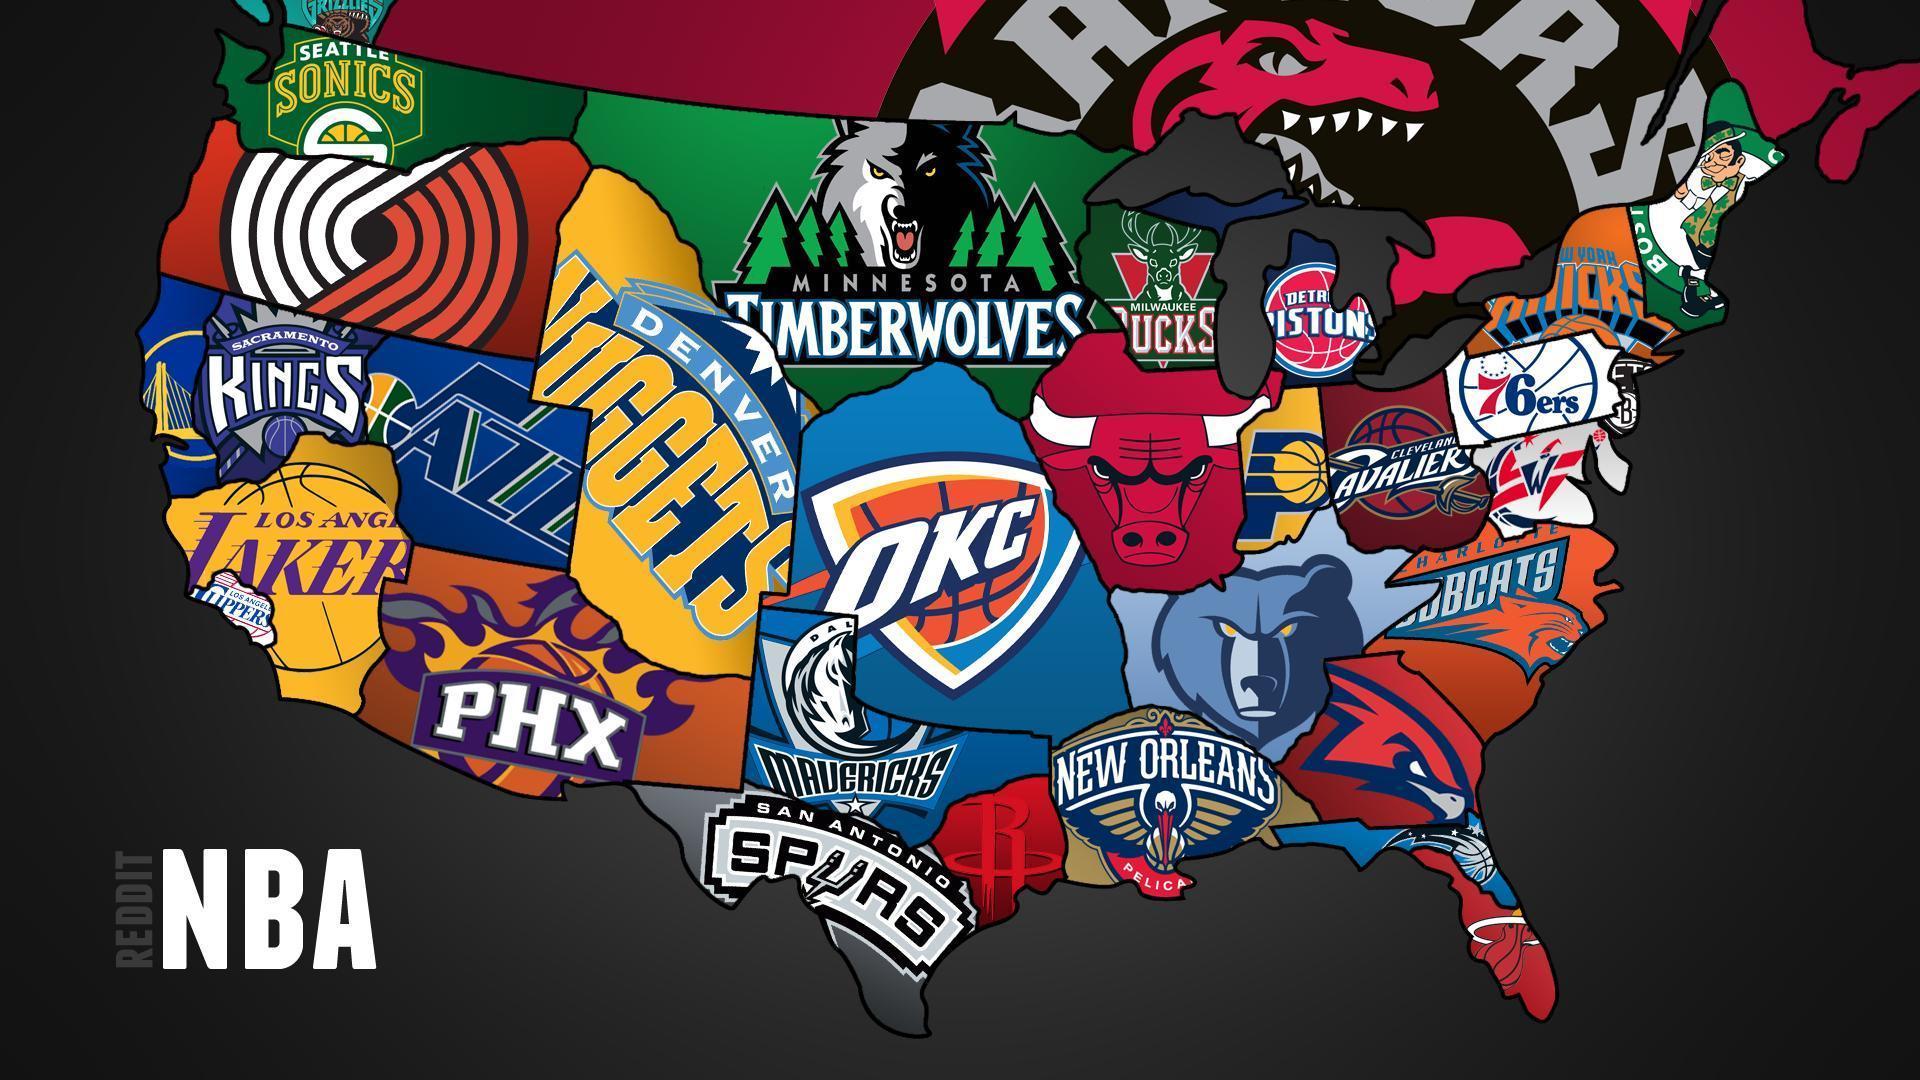 Cool map of NBA teams   1920x1080   Full HD 169   Wallpaper 1772 on 1920x1080